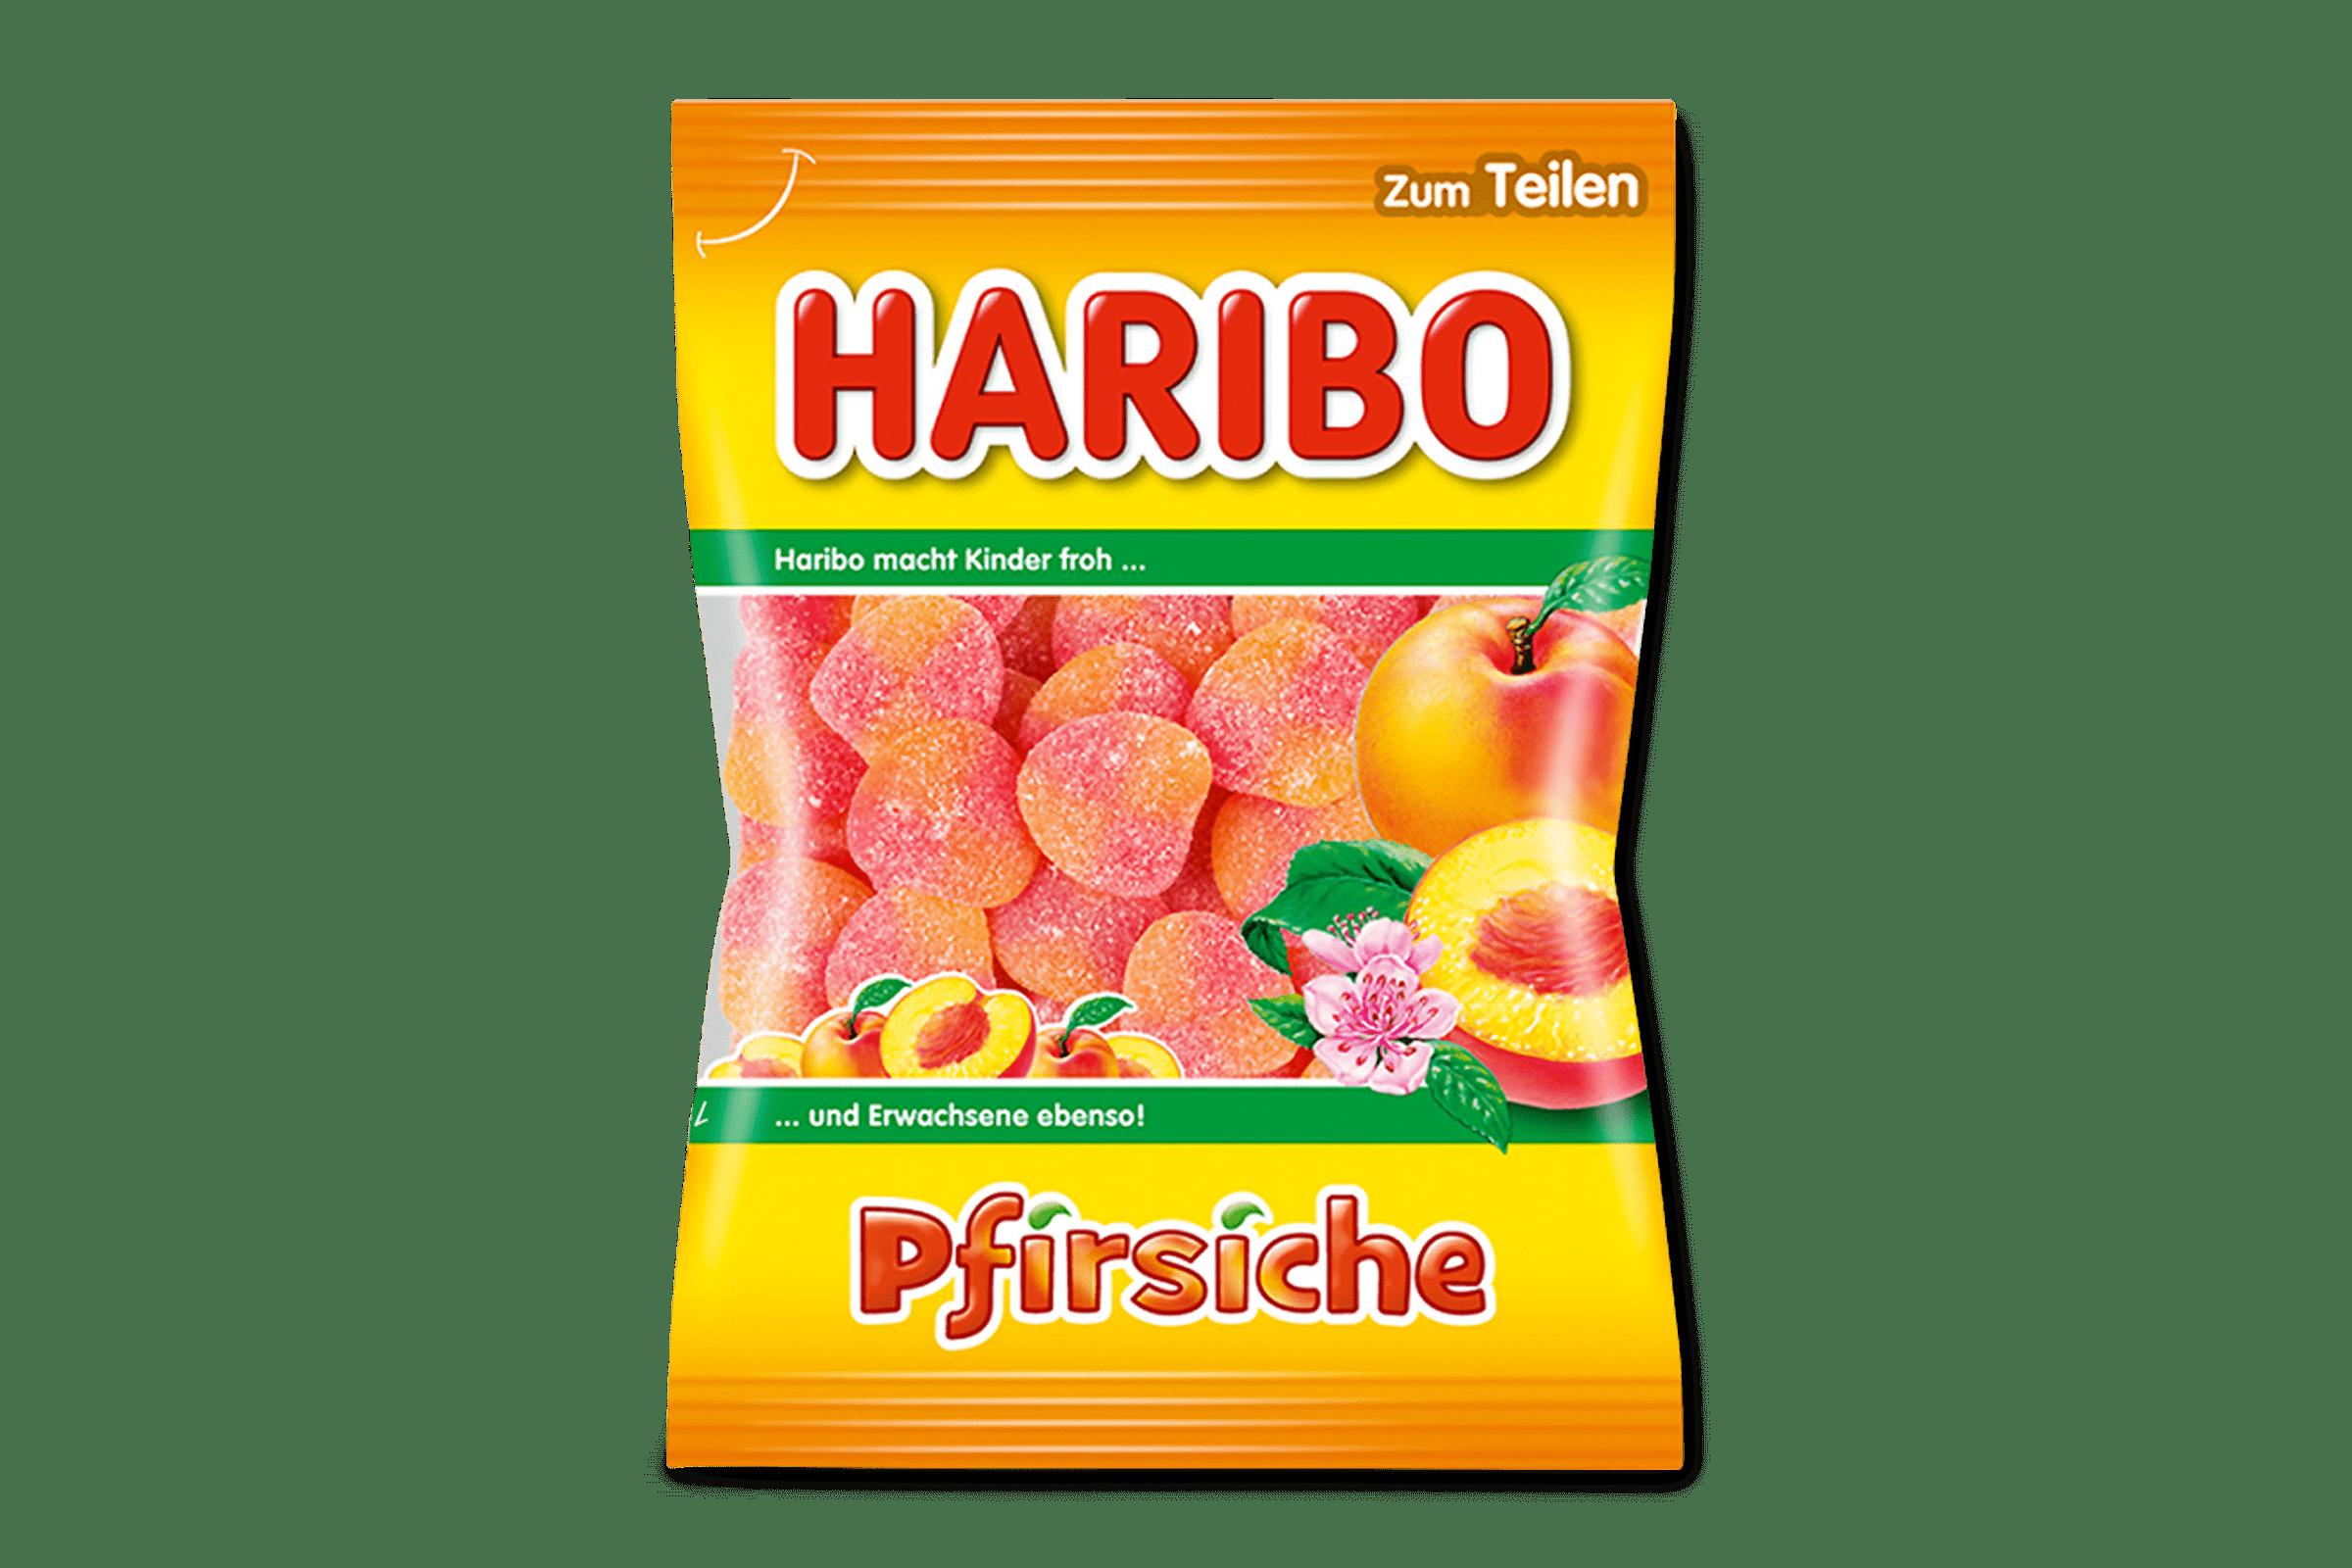 Haribo Pfirsiche 1